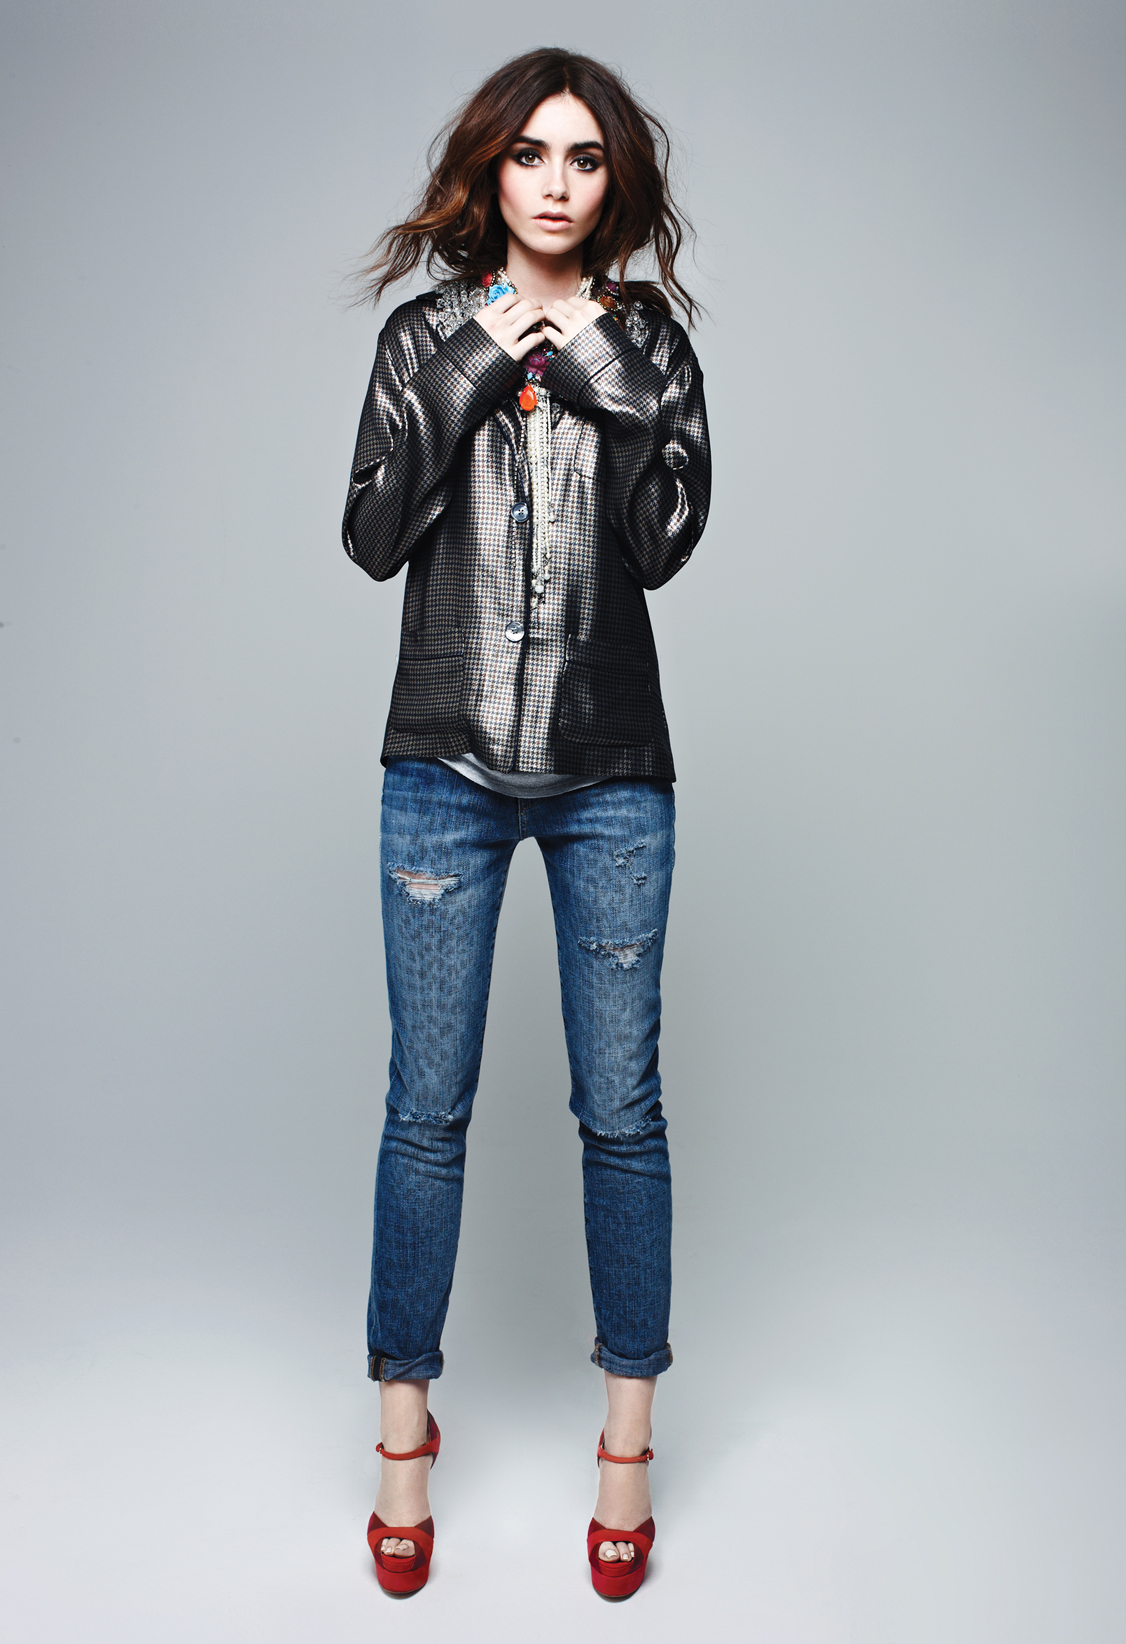 Lily Collins 2013 : Lily Collins: Elle Magazine 2013 -03